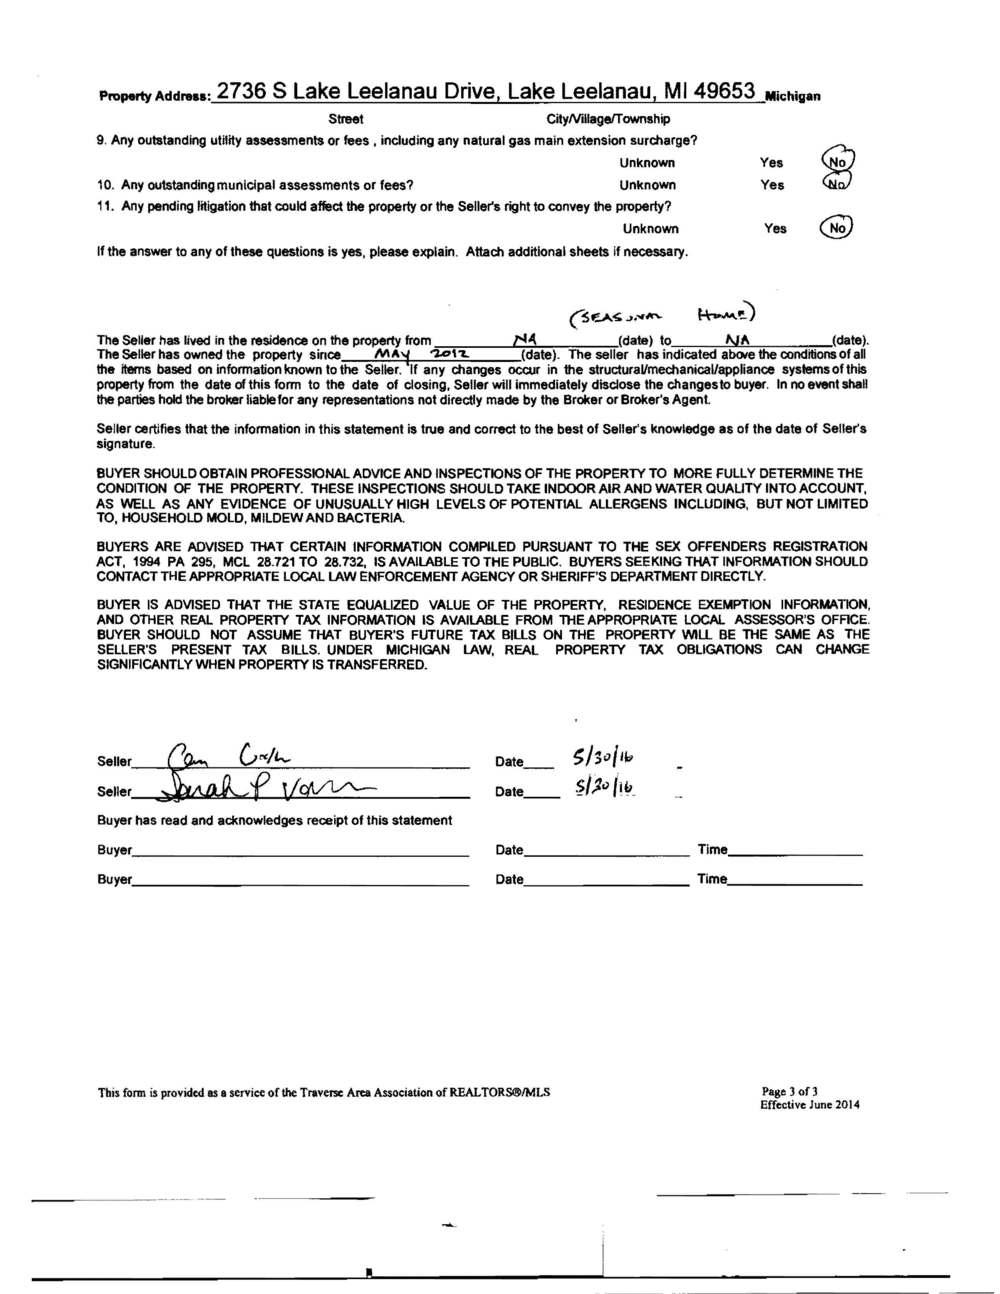 2736 S Lake Leelanau Dr, South Lake Leelanau Waterfront for sale by Oltersdorf Realty LLC - Marketing Packet (14).jpg